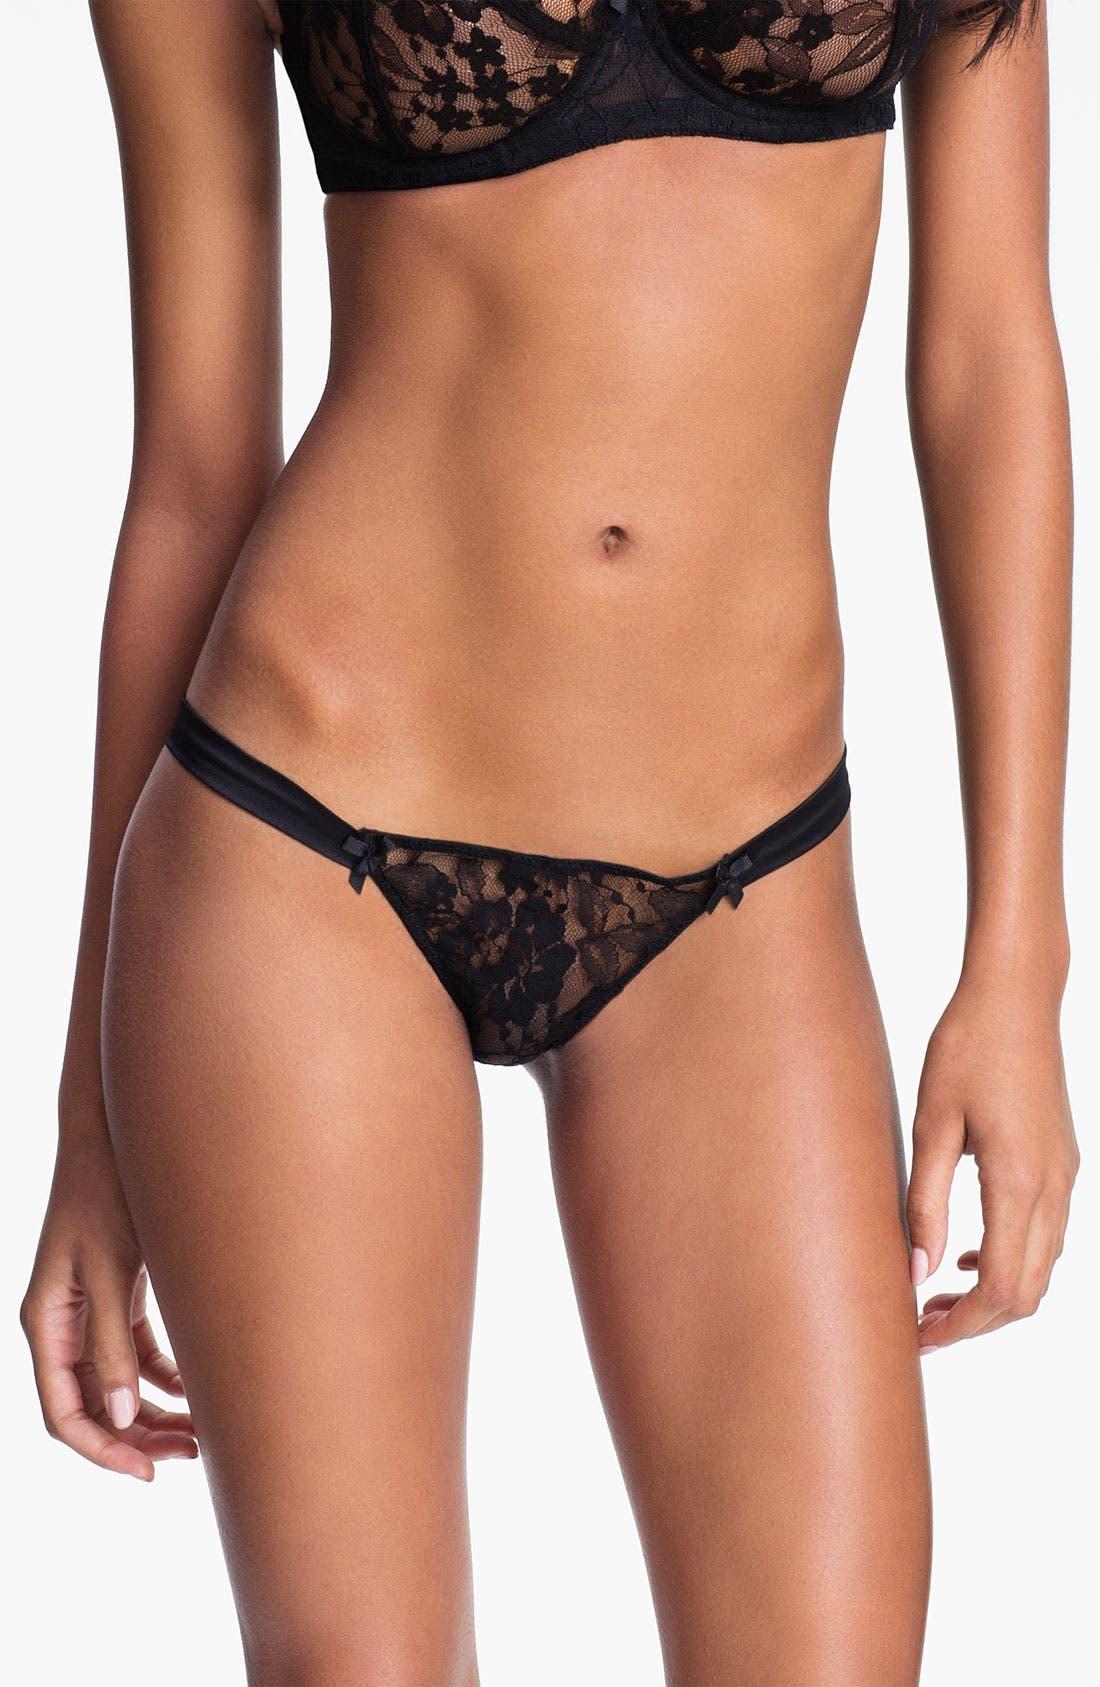 Alternate Image 1 Selected - Mimi Holliday 'Angelique Jet' Bikini